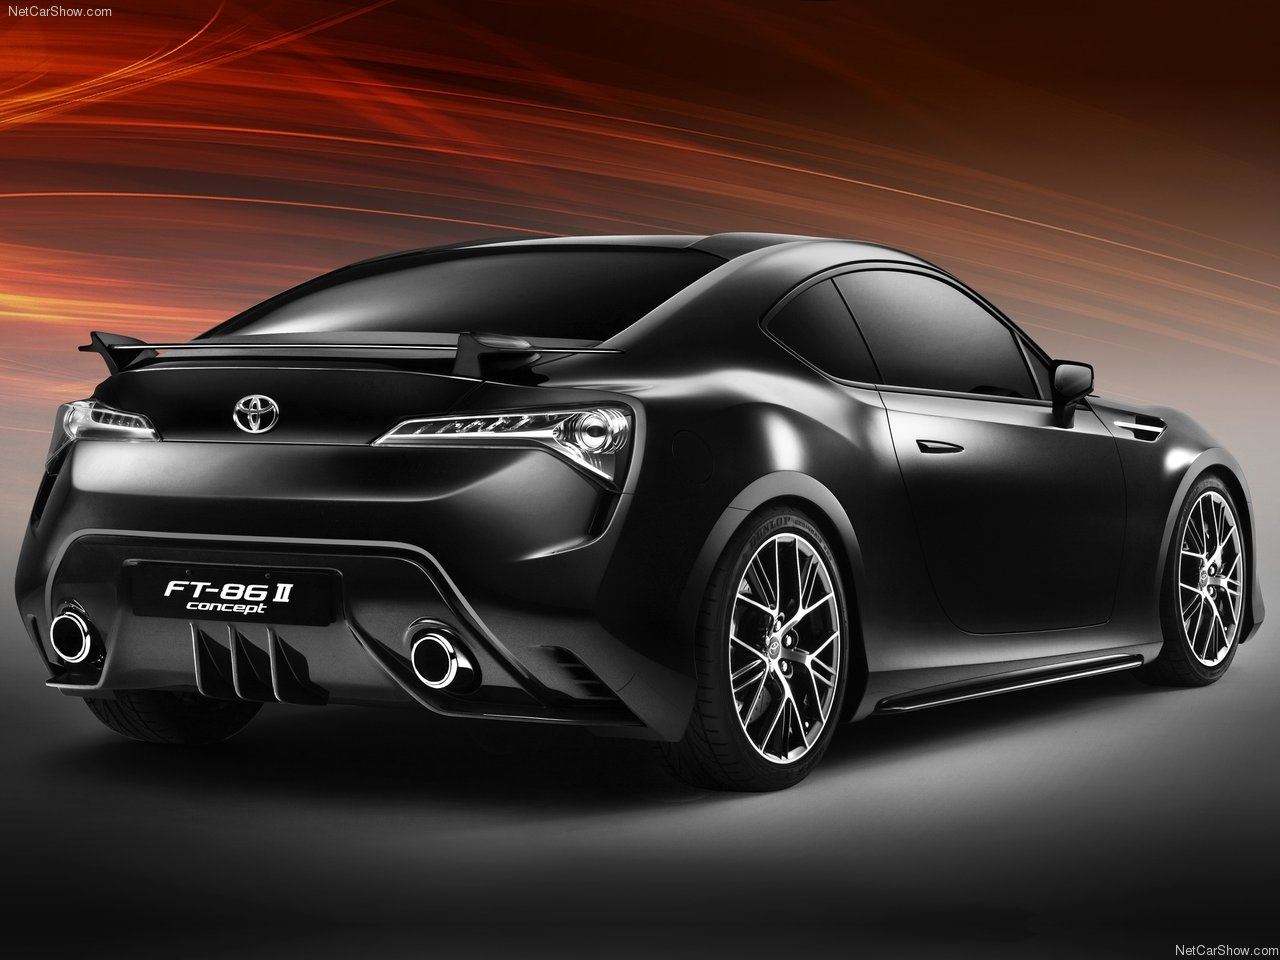 https://4.bp.blogspot.com/--LDoDZEleWU/TWzAO856KrI/AAAAAAAALfQ/zGsYG6Ut2Sc/s1600/Toyota-FT-86_II_Concept_2011_1280x960_wallpaper_03.jpg